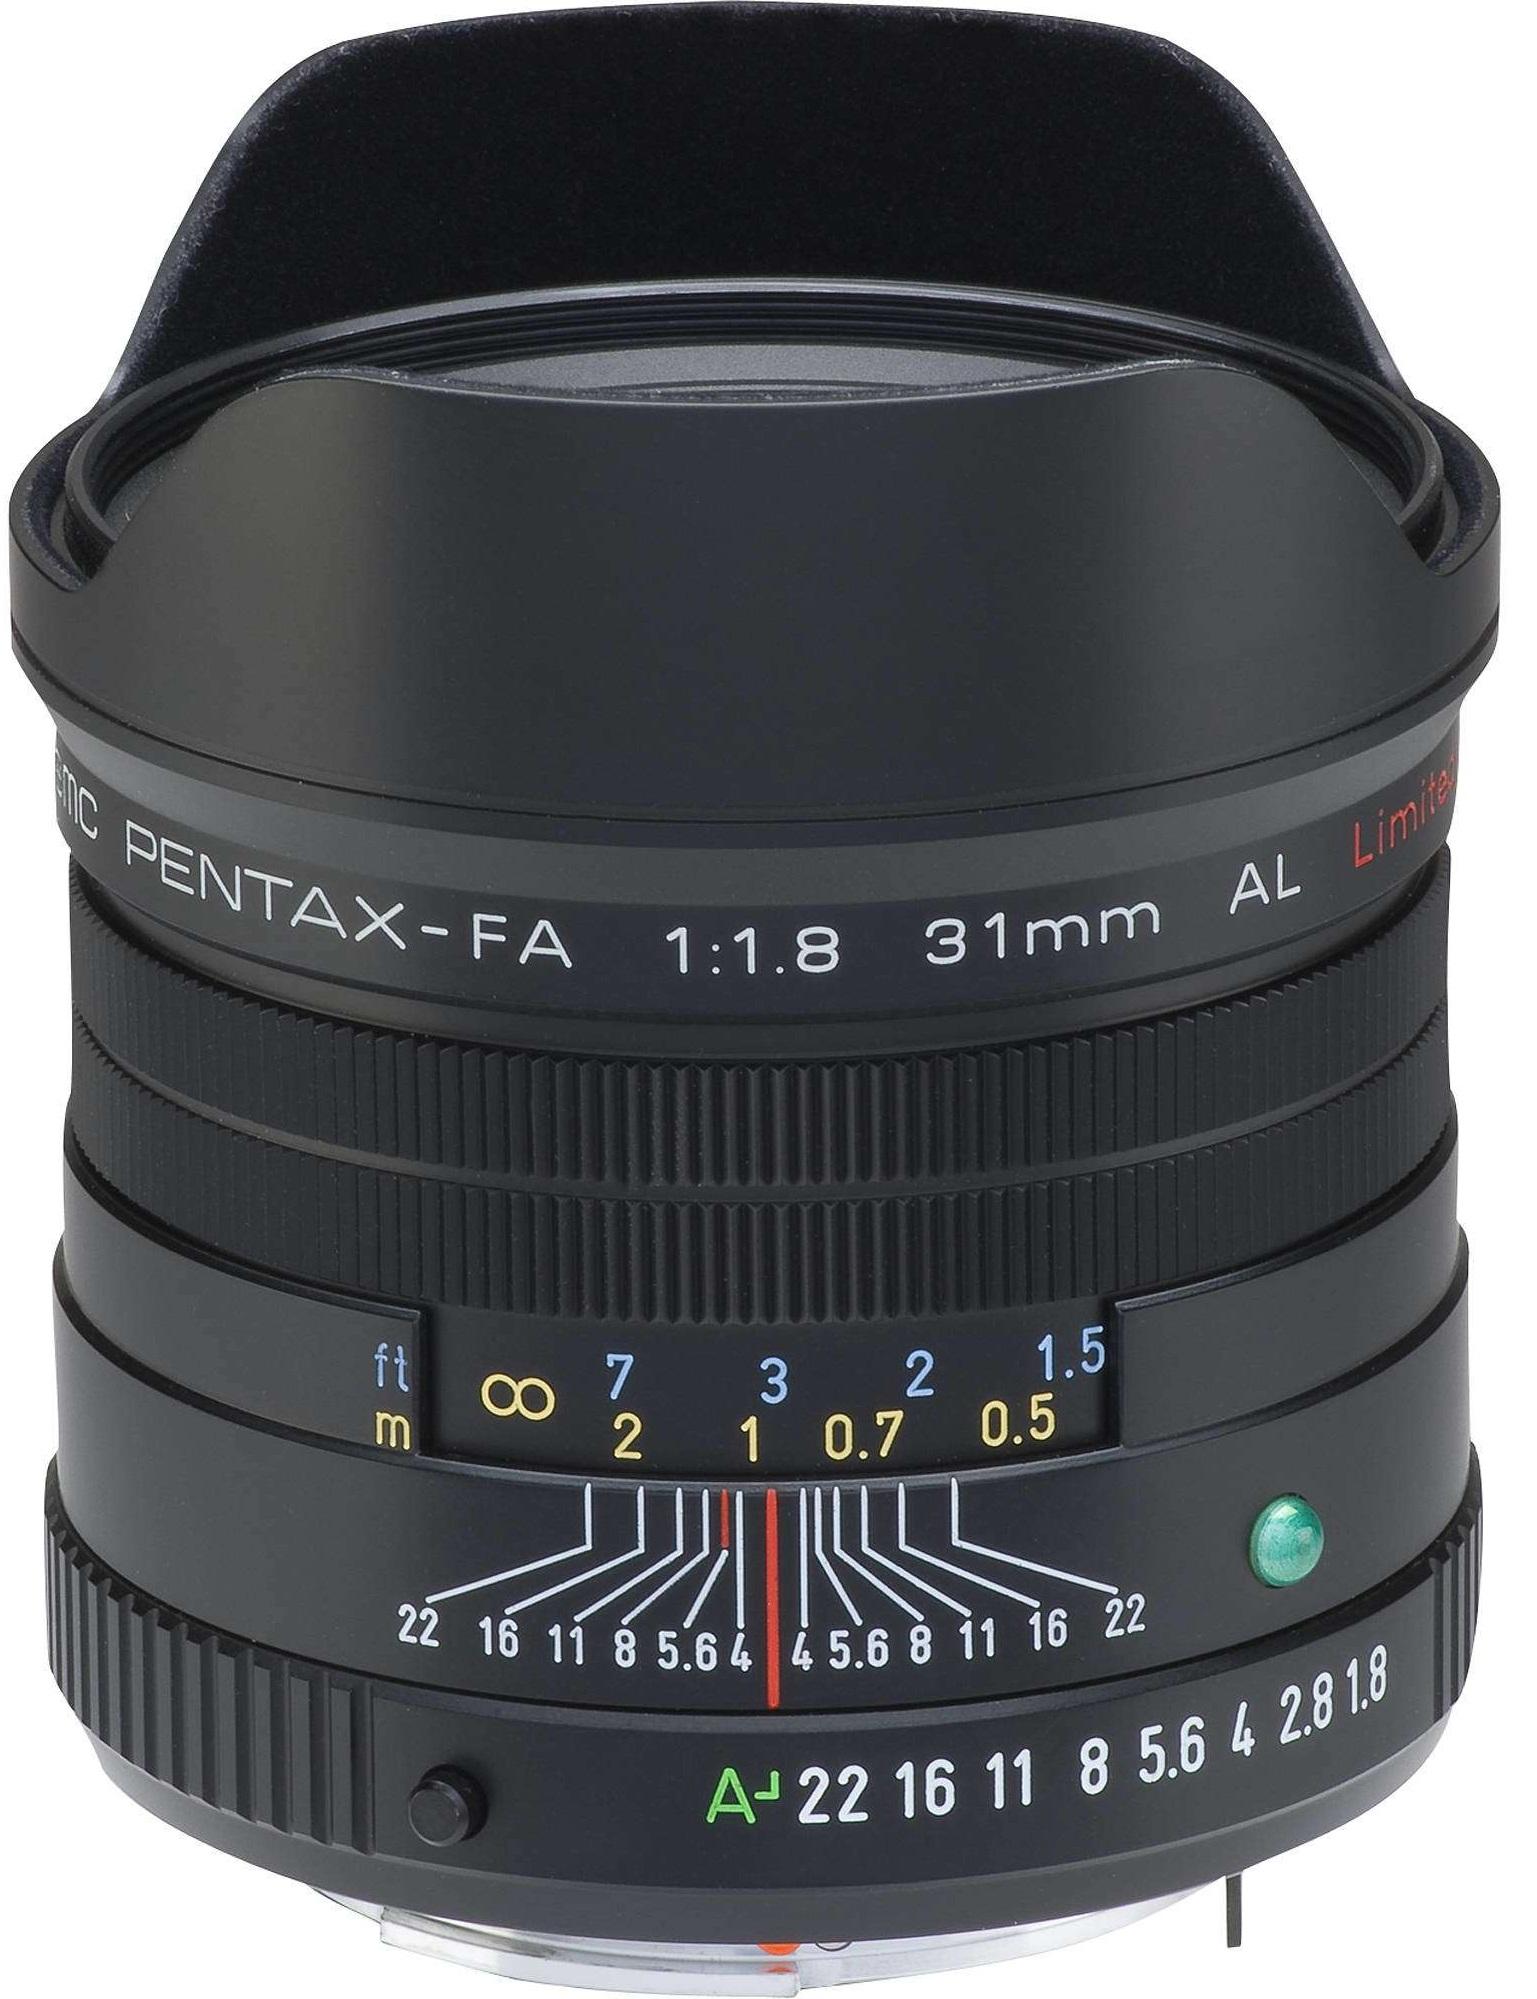 Pentax SMC FA 31mm